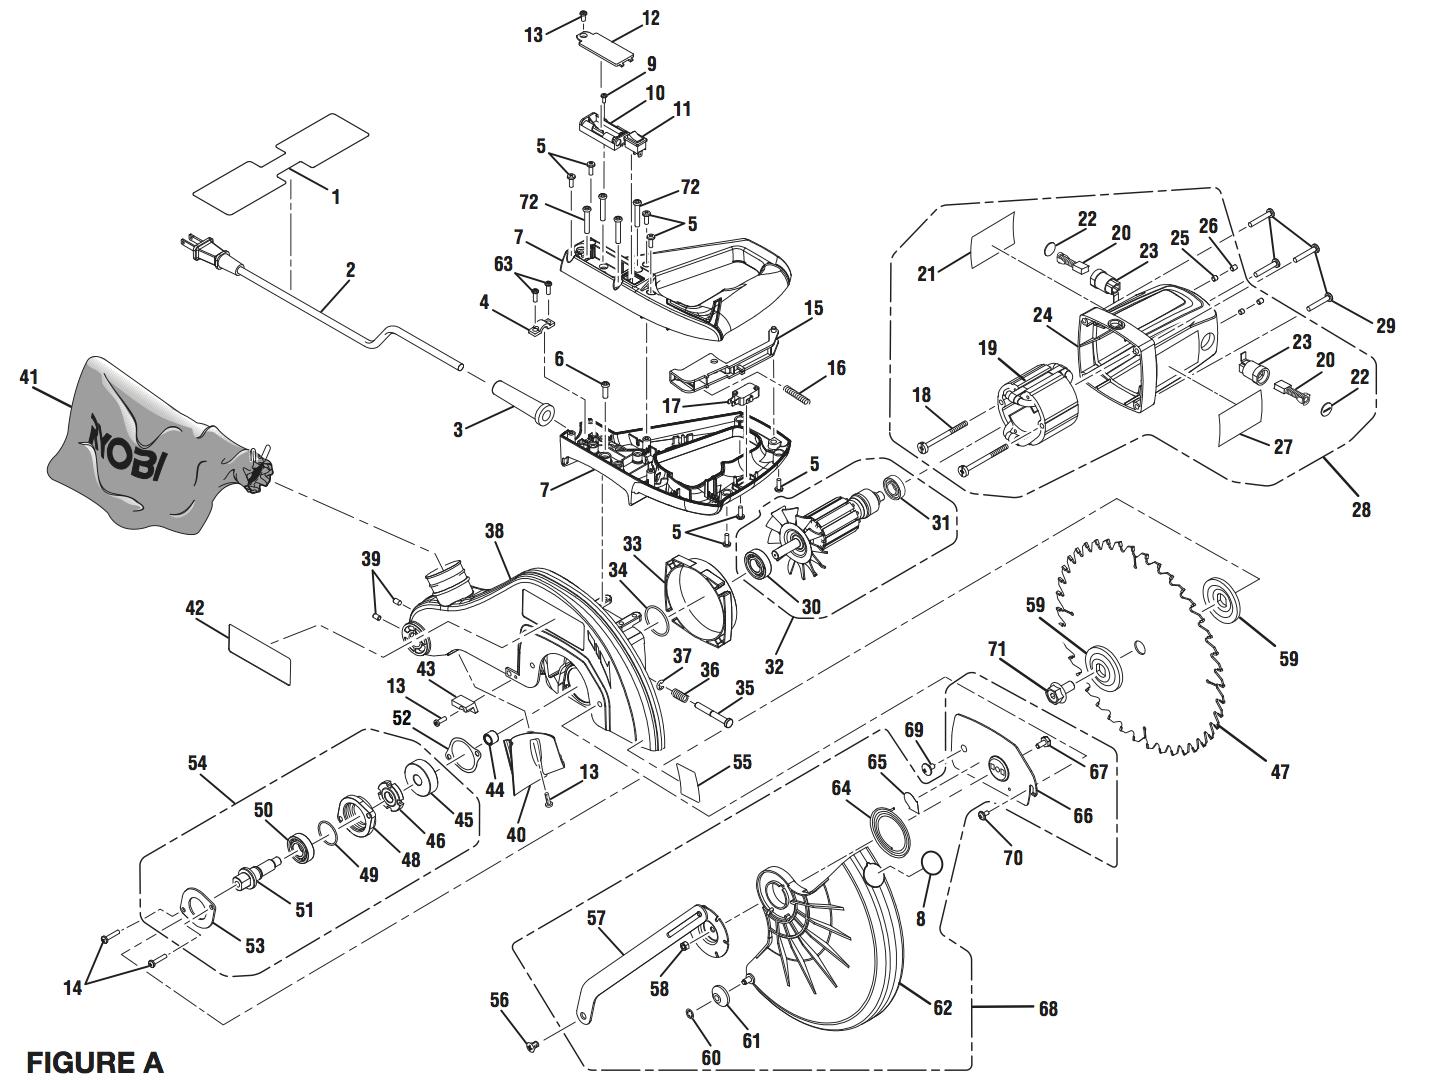 Ts L Ryobi Miter Saw Exploded View Parts Diagram